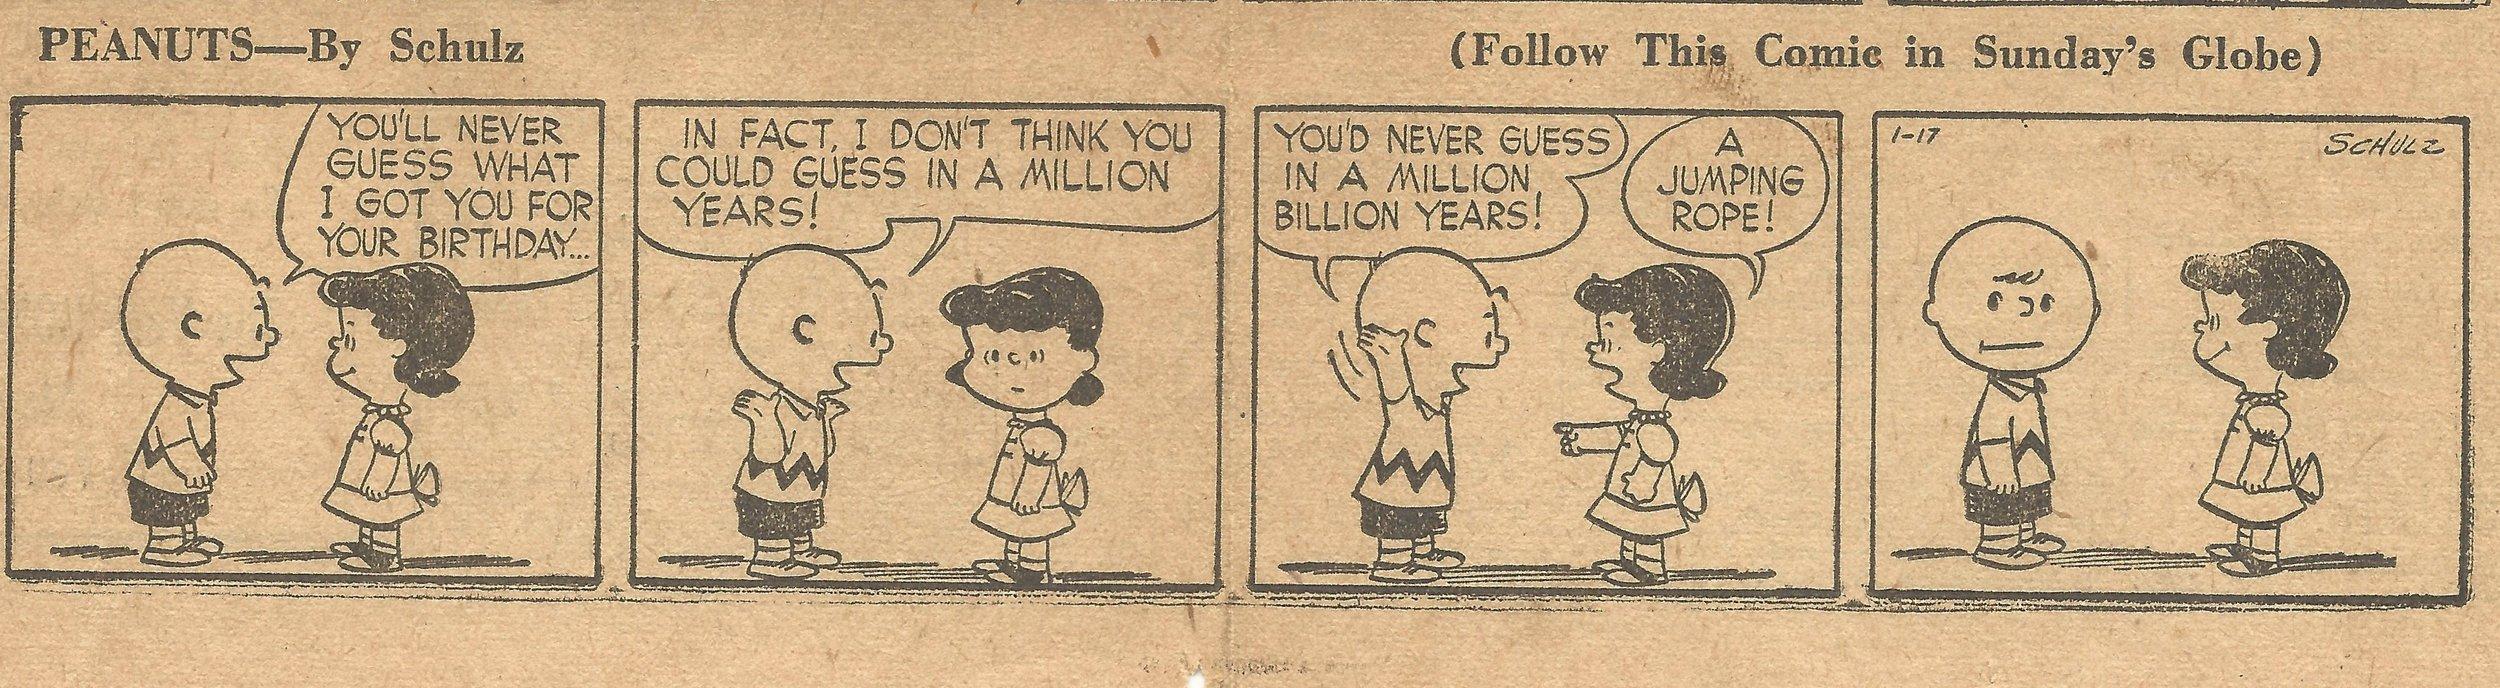 10. Jan. 18, 1953 (Oma)_Page_6.jpg